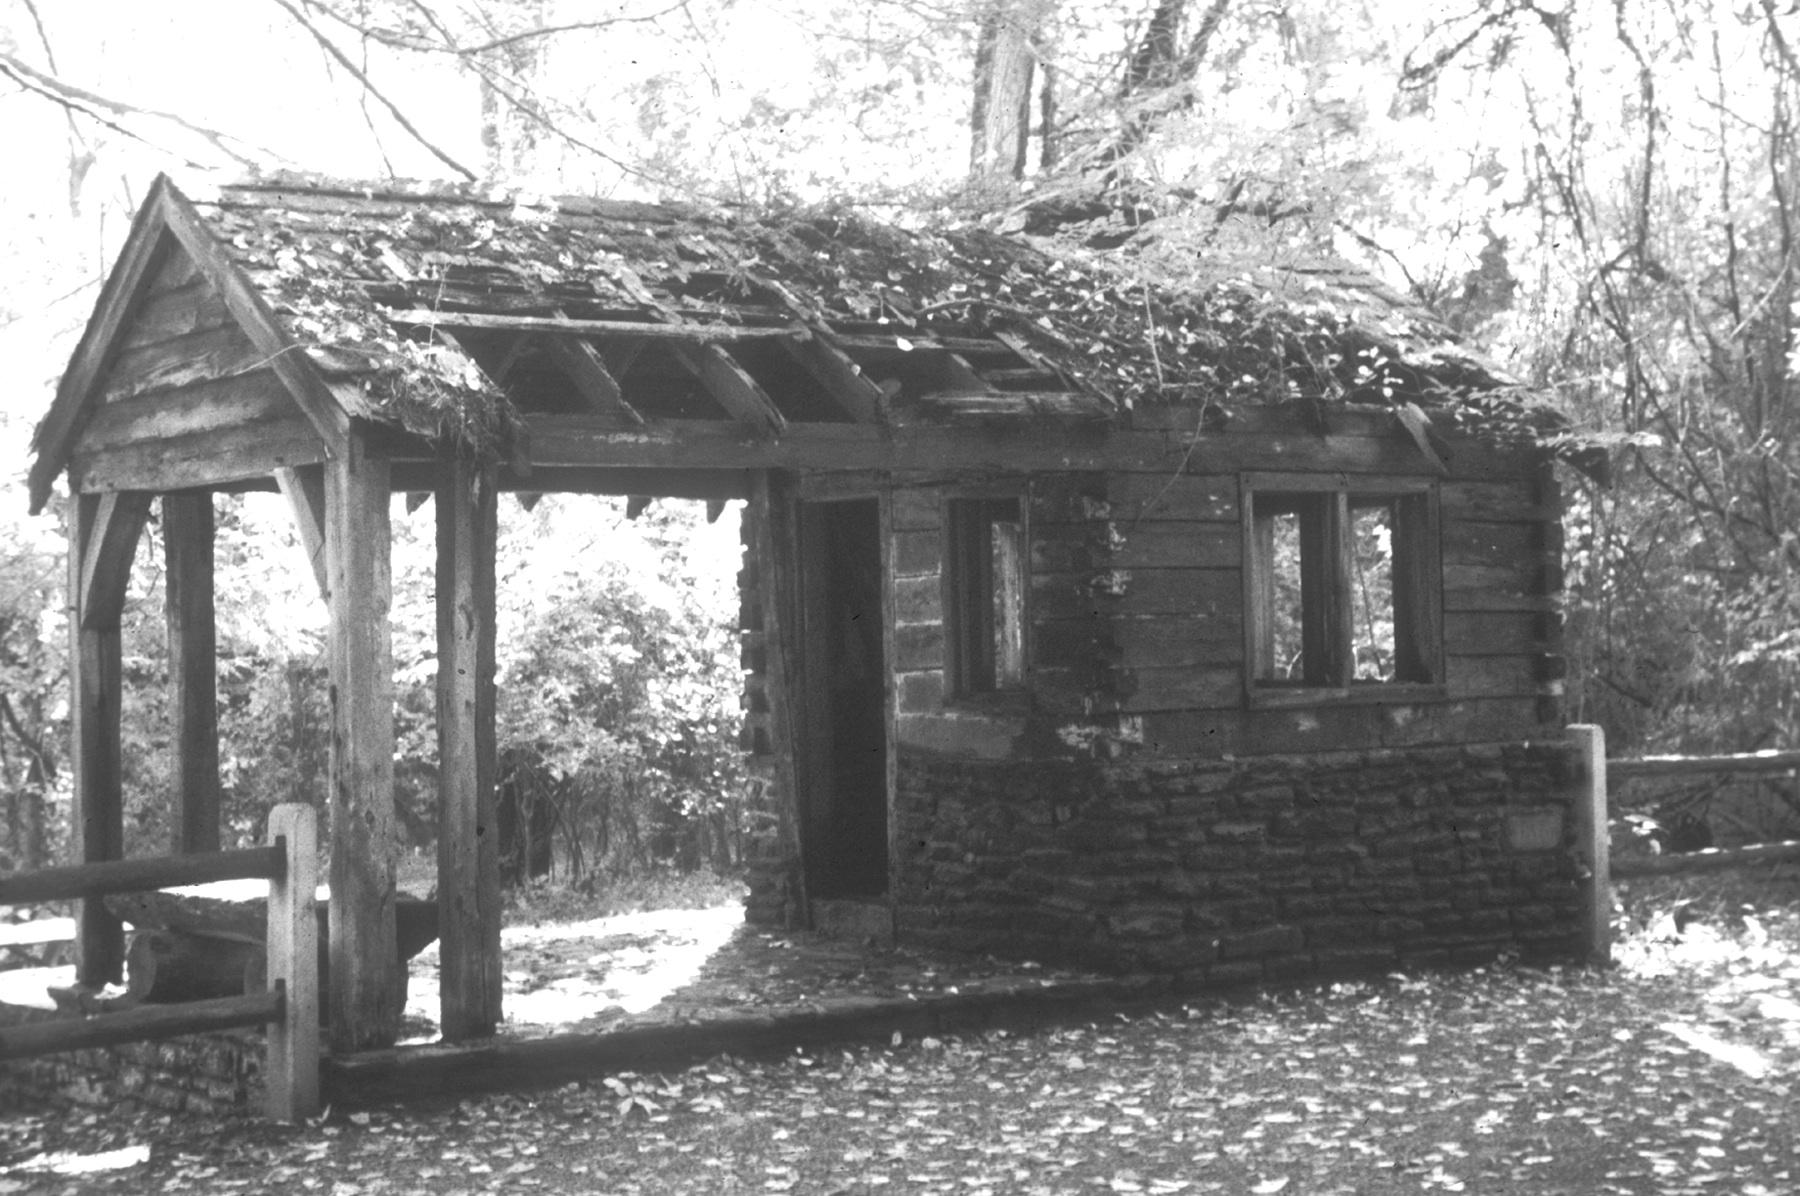 Figure 5. Allen's Lane guard shelter, 1996 (K. Cowing).